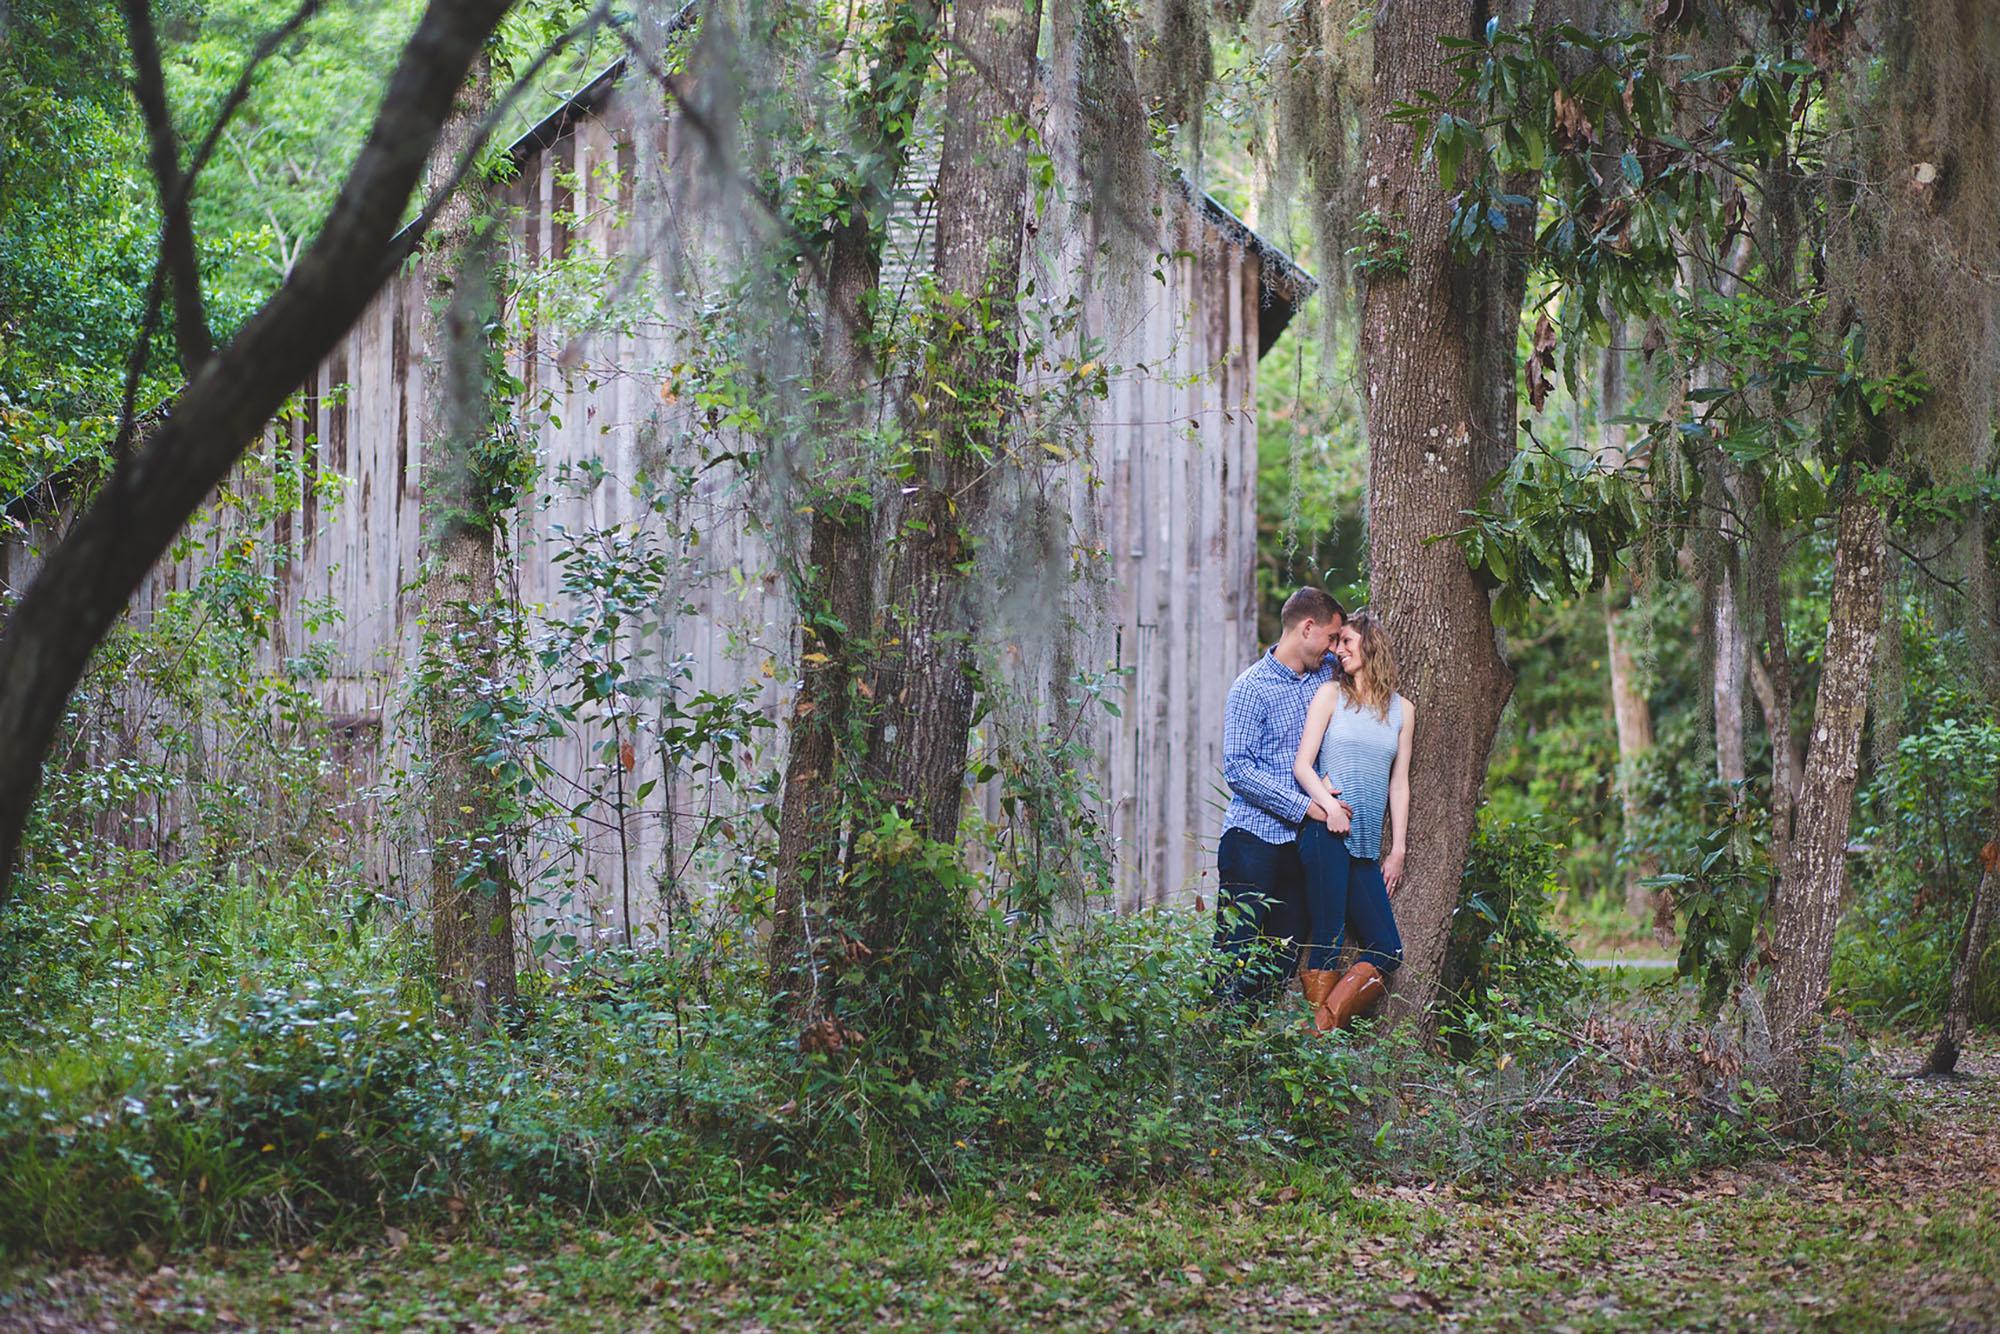 adam-szarmack-Walter-Jones-Historical-Park-engagement-2.jpg